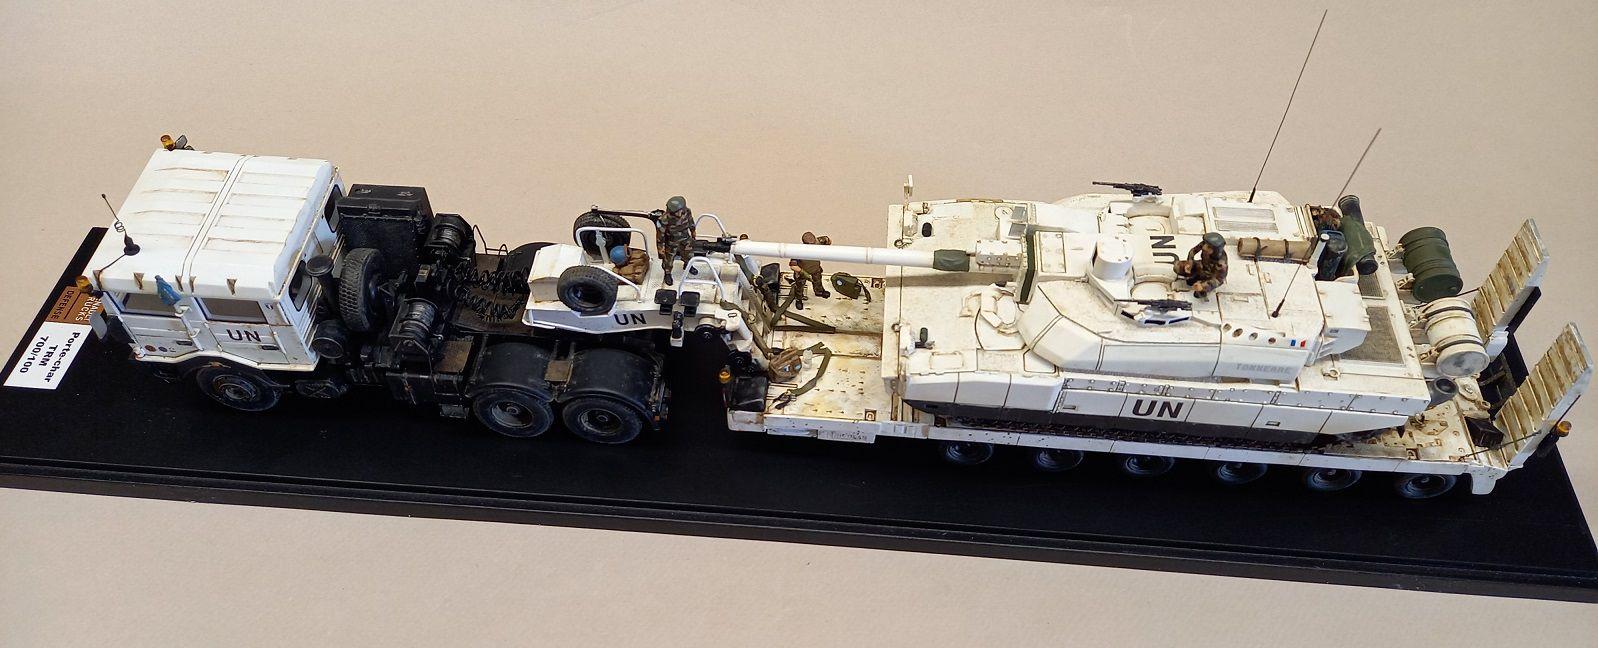   TRM 700-100 + char Leclerc/VBCI  (Master Fighter - 1/48 - par Robert B.) 